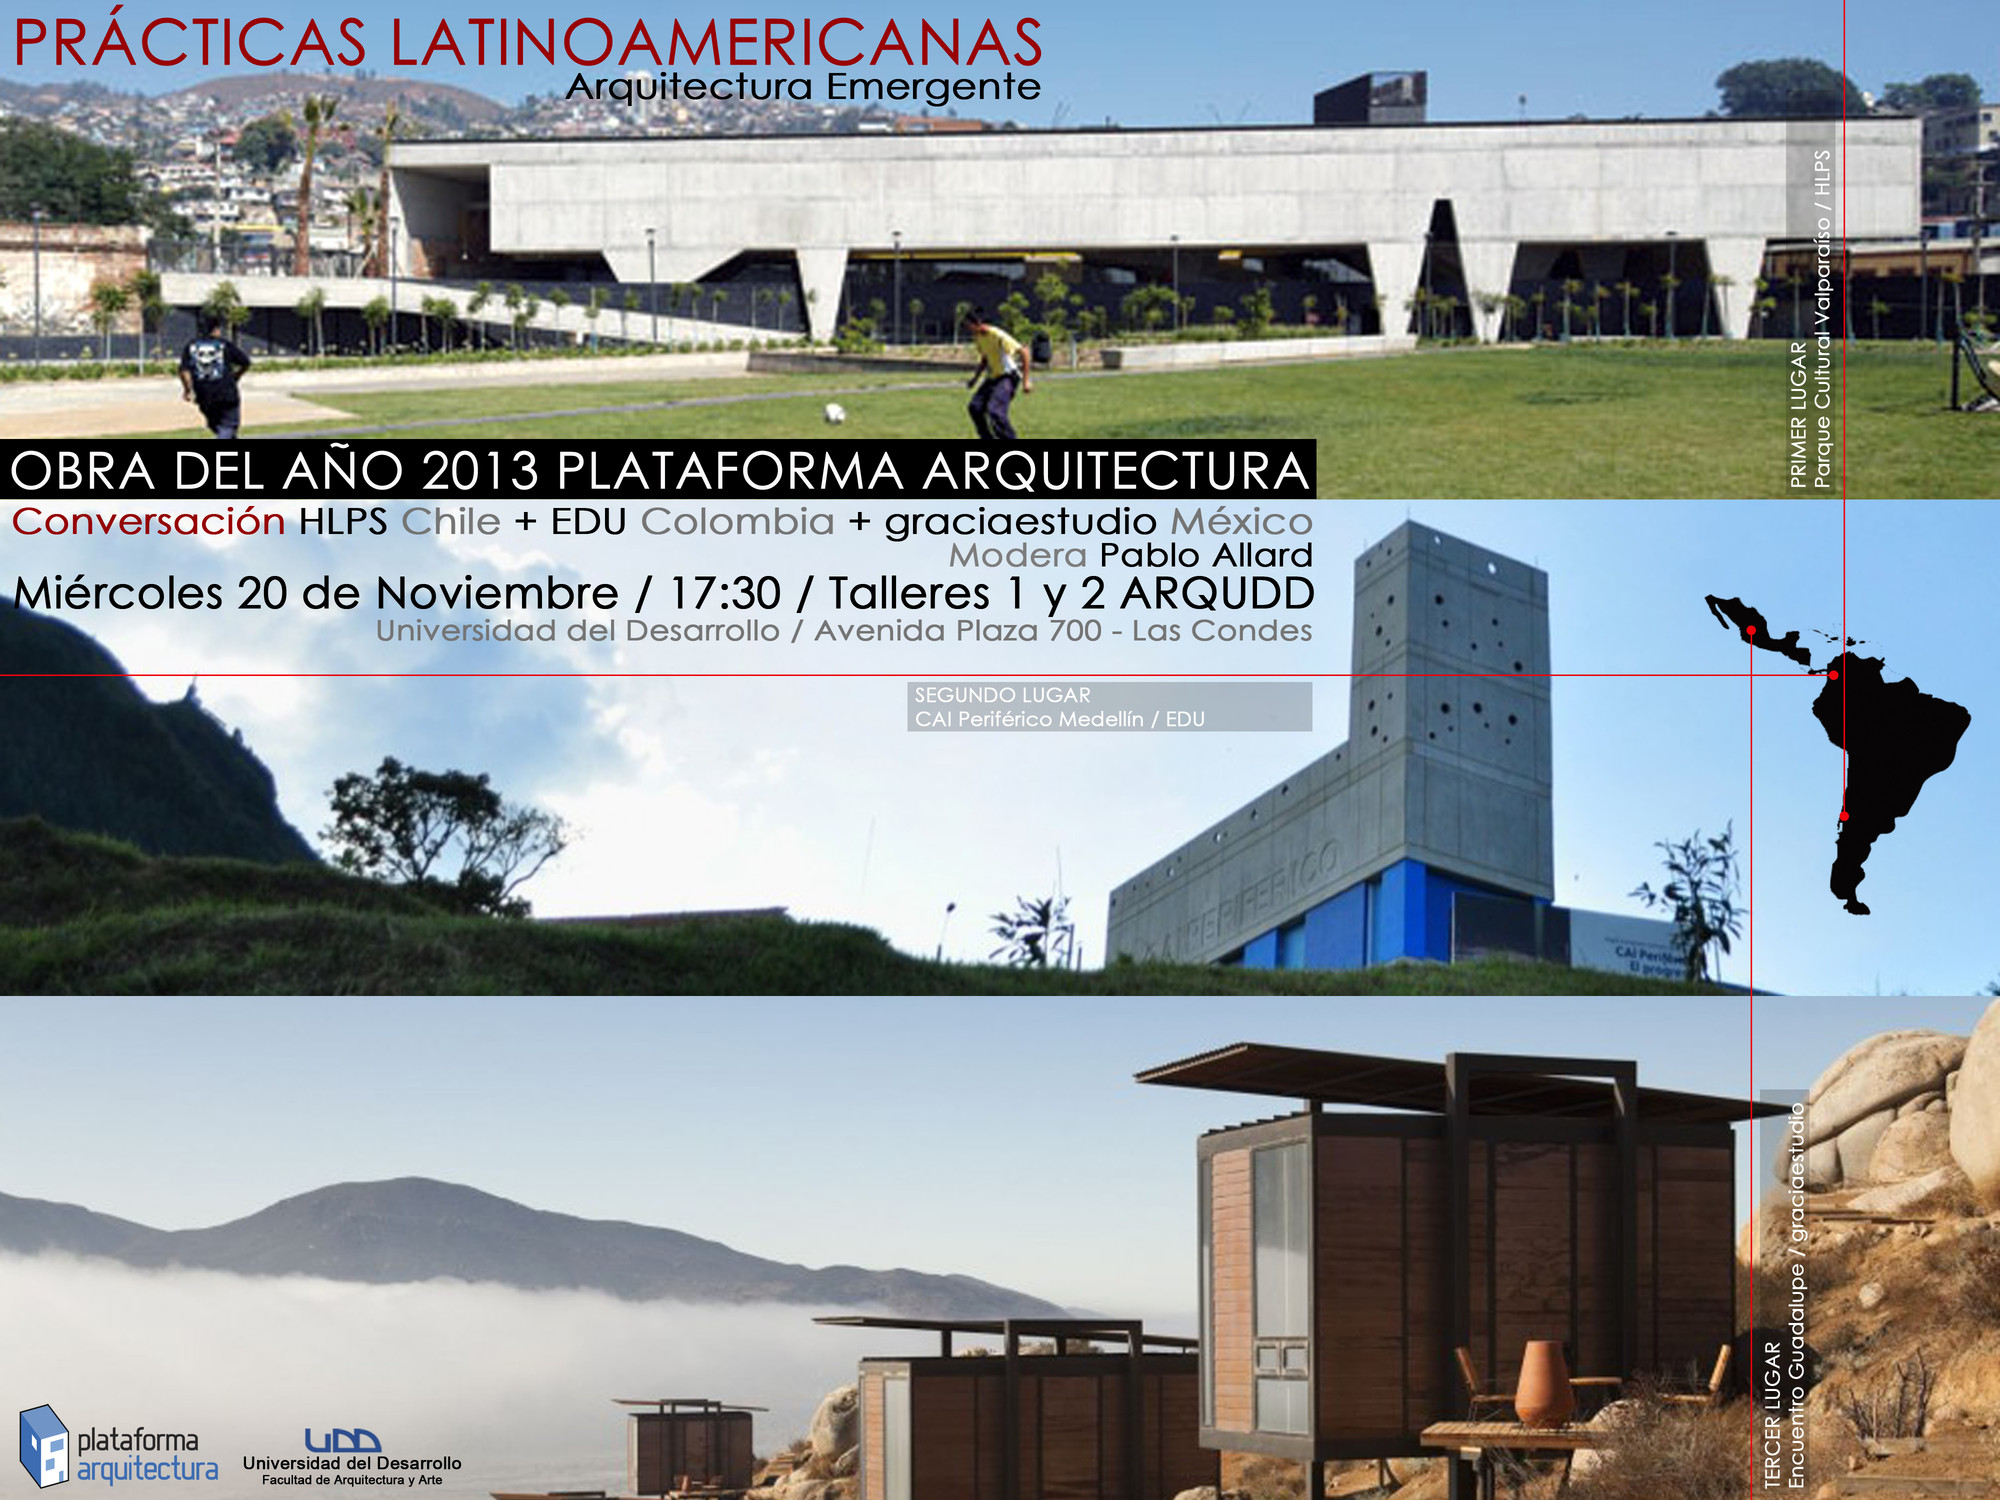 Prácticas Latinoamericanas, Arquitectura Emergente